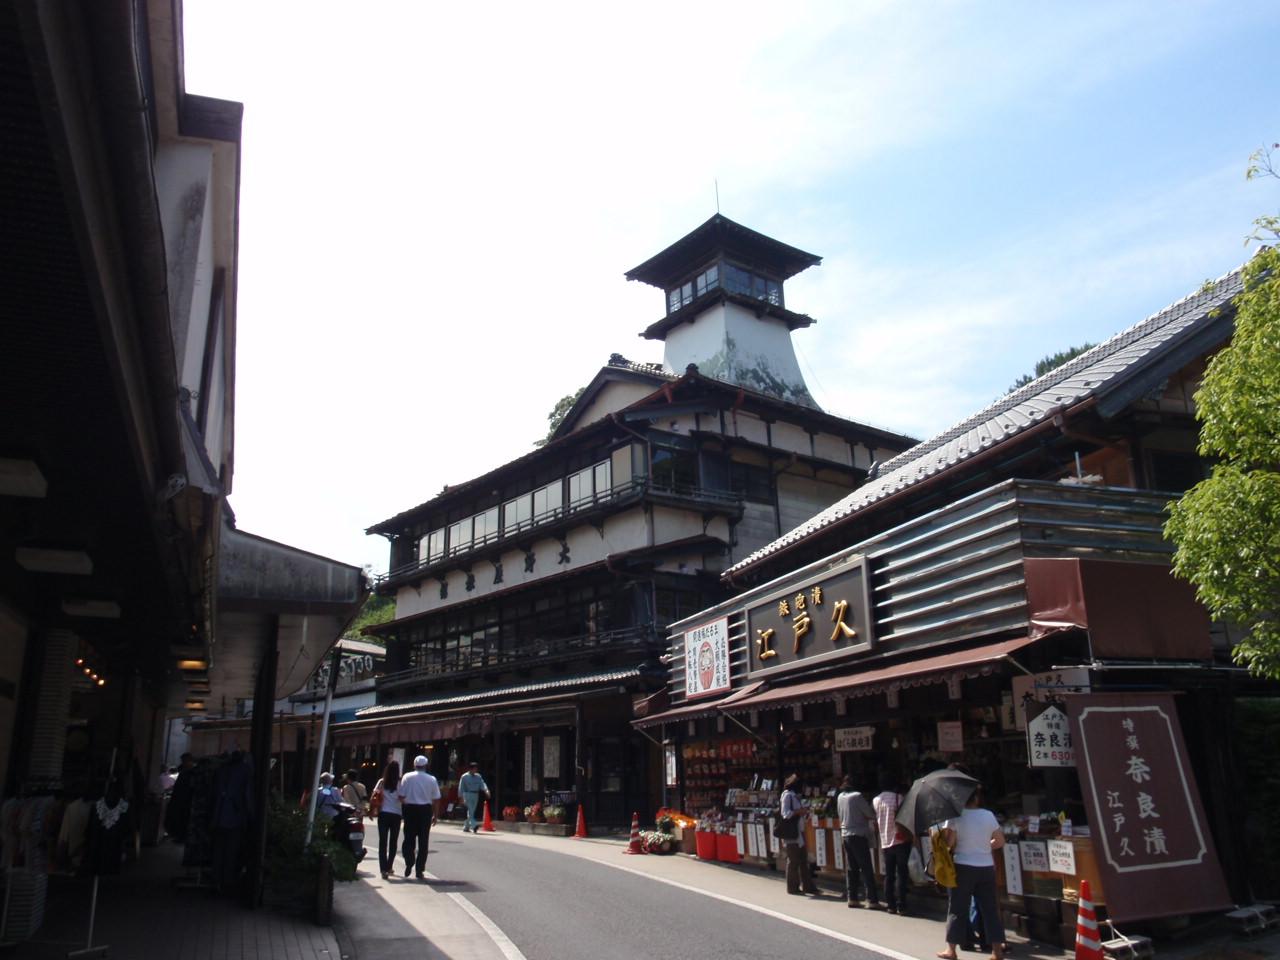 5 Closest Hotels to Narita Airport (NRT) - TripAdvisor